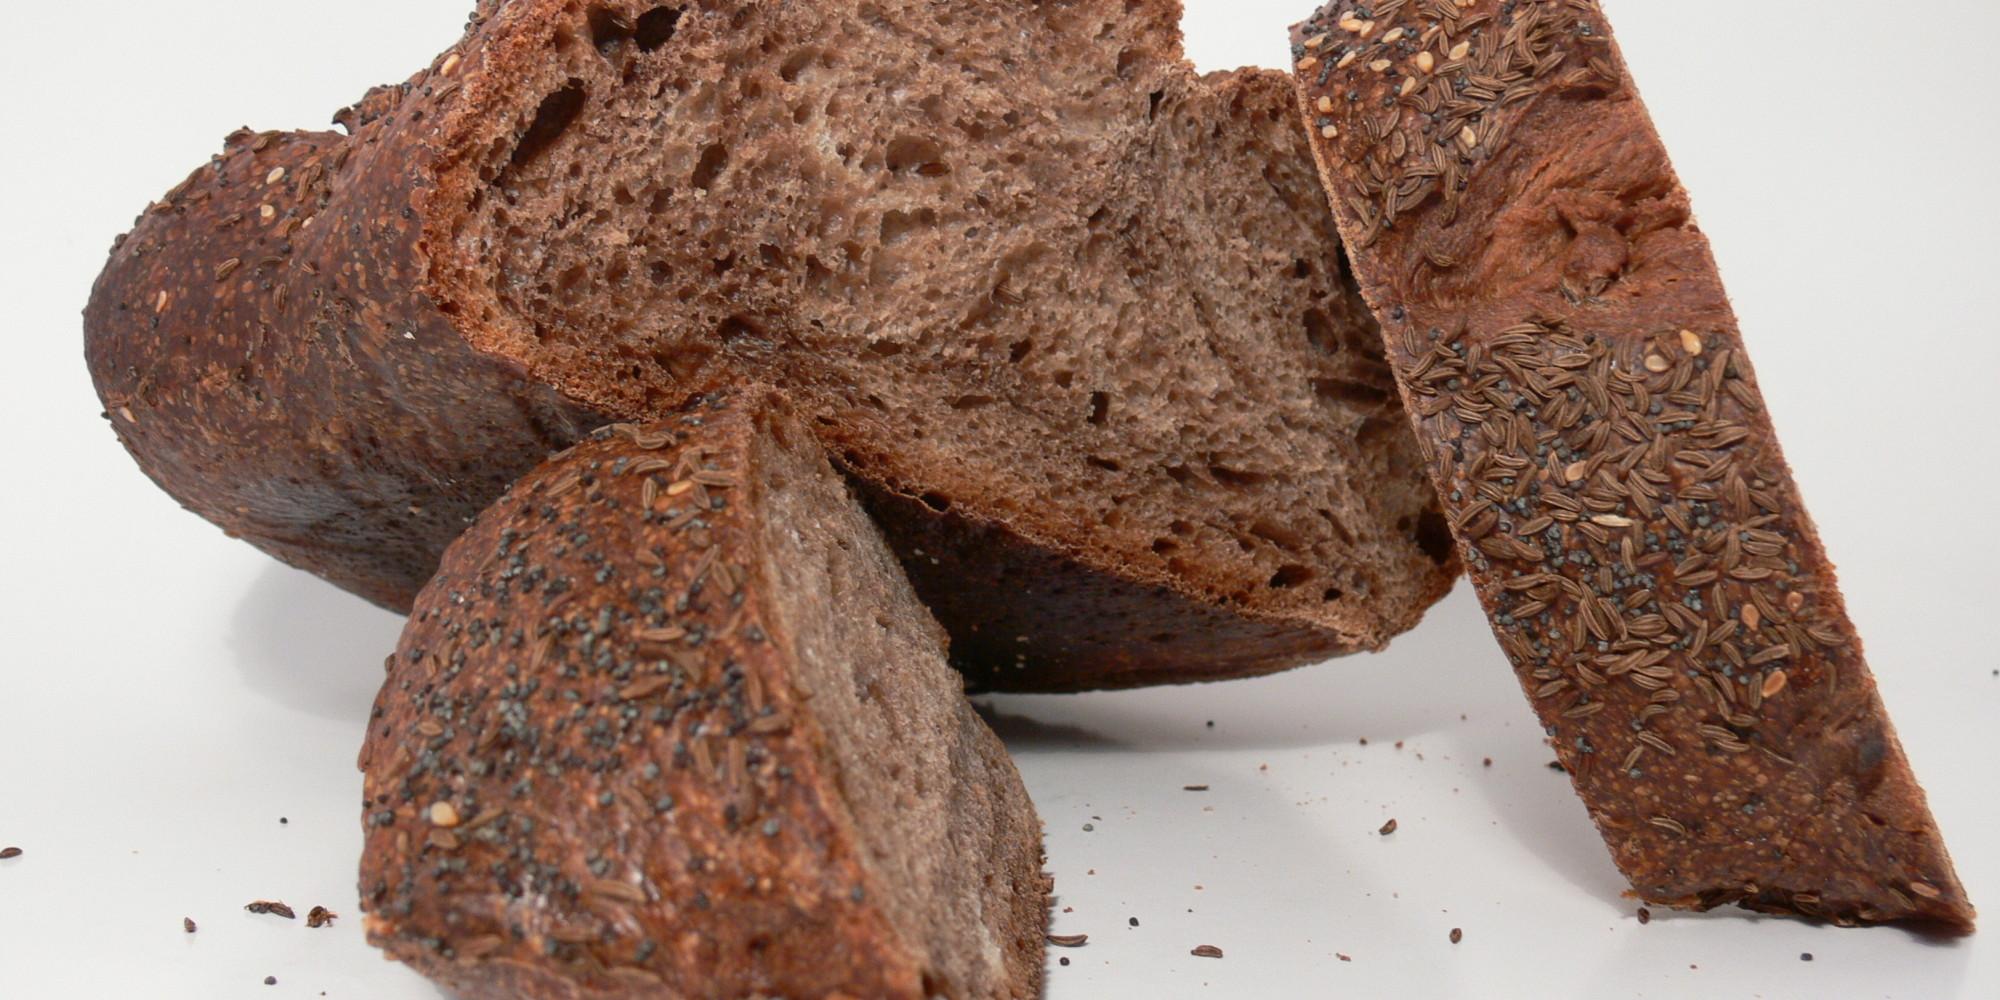 so  pumpernickel bread was named after a farting devil